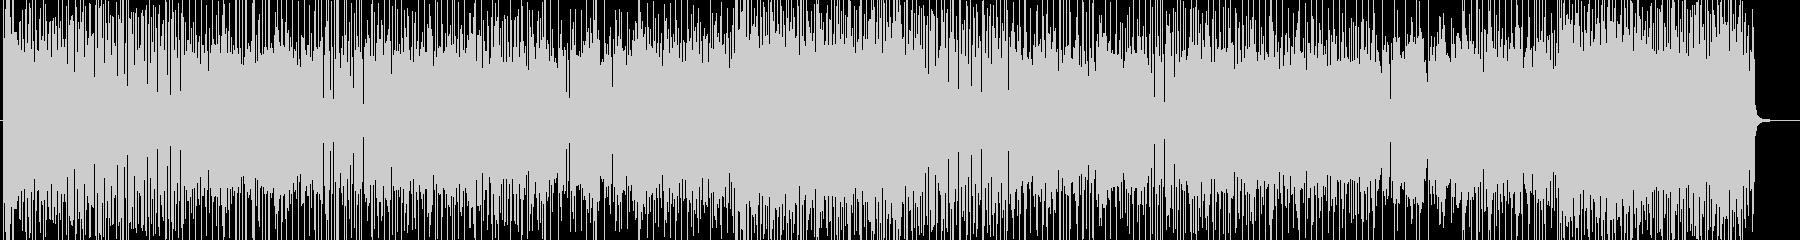 「HR/HM」「DARK」BGM128の未再生の波形